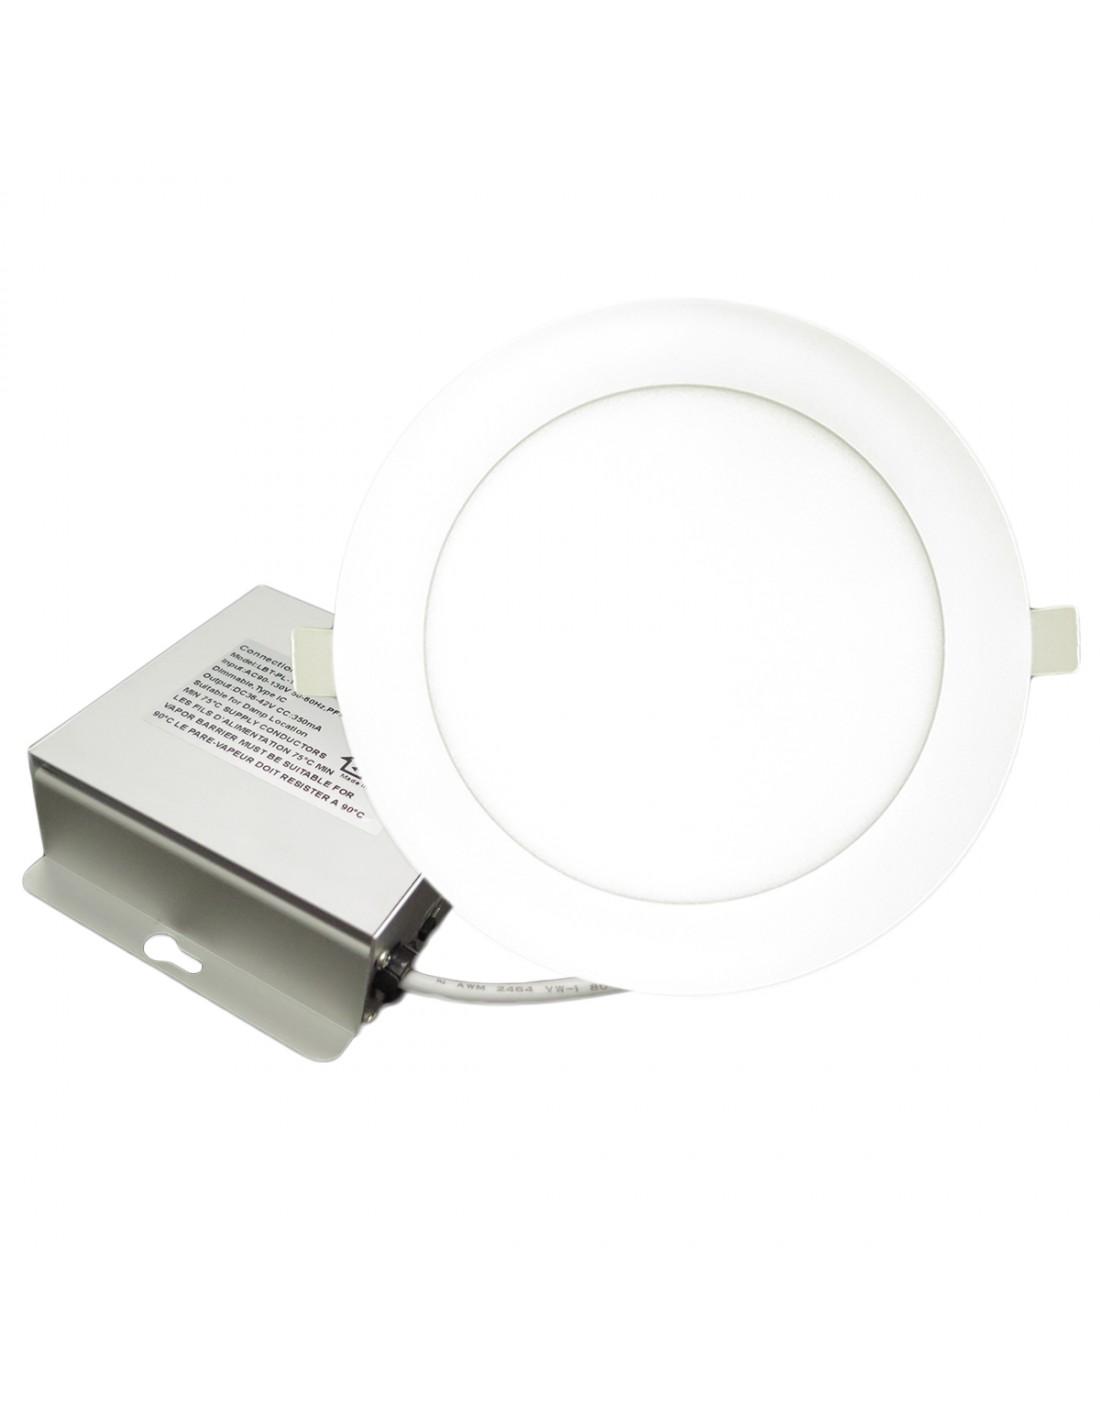 6 inch variable cct slim pot light